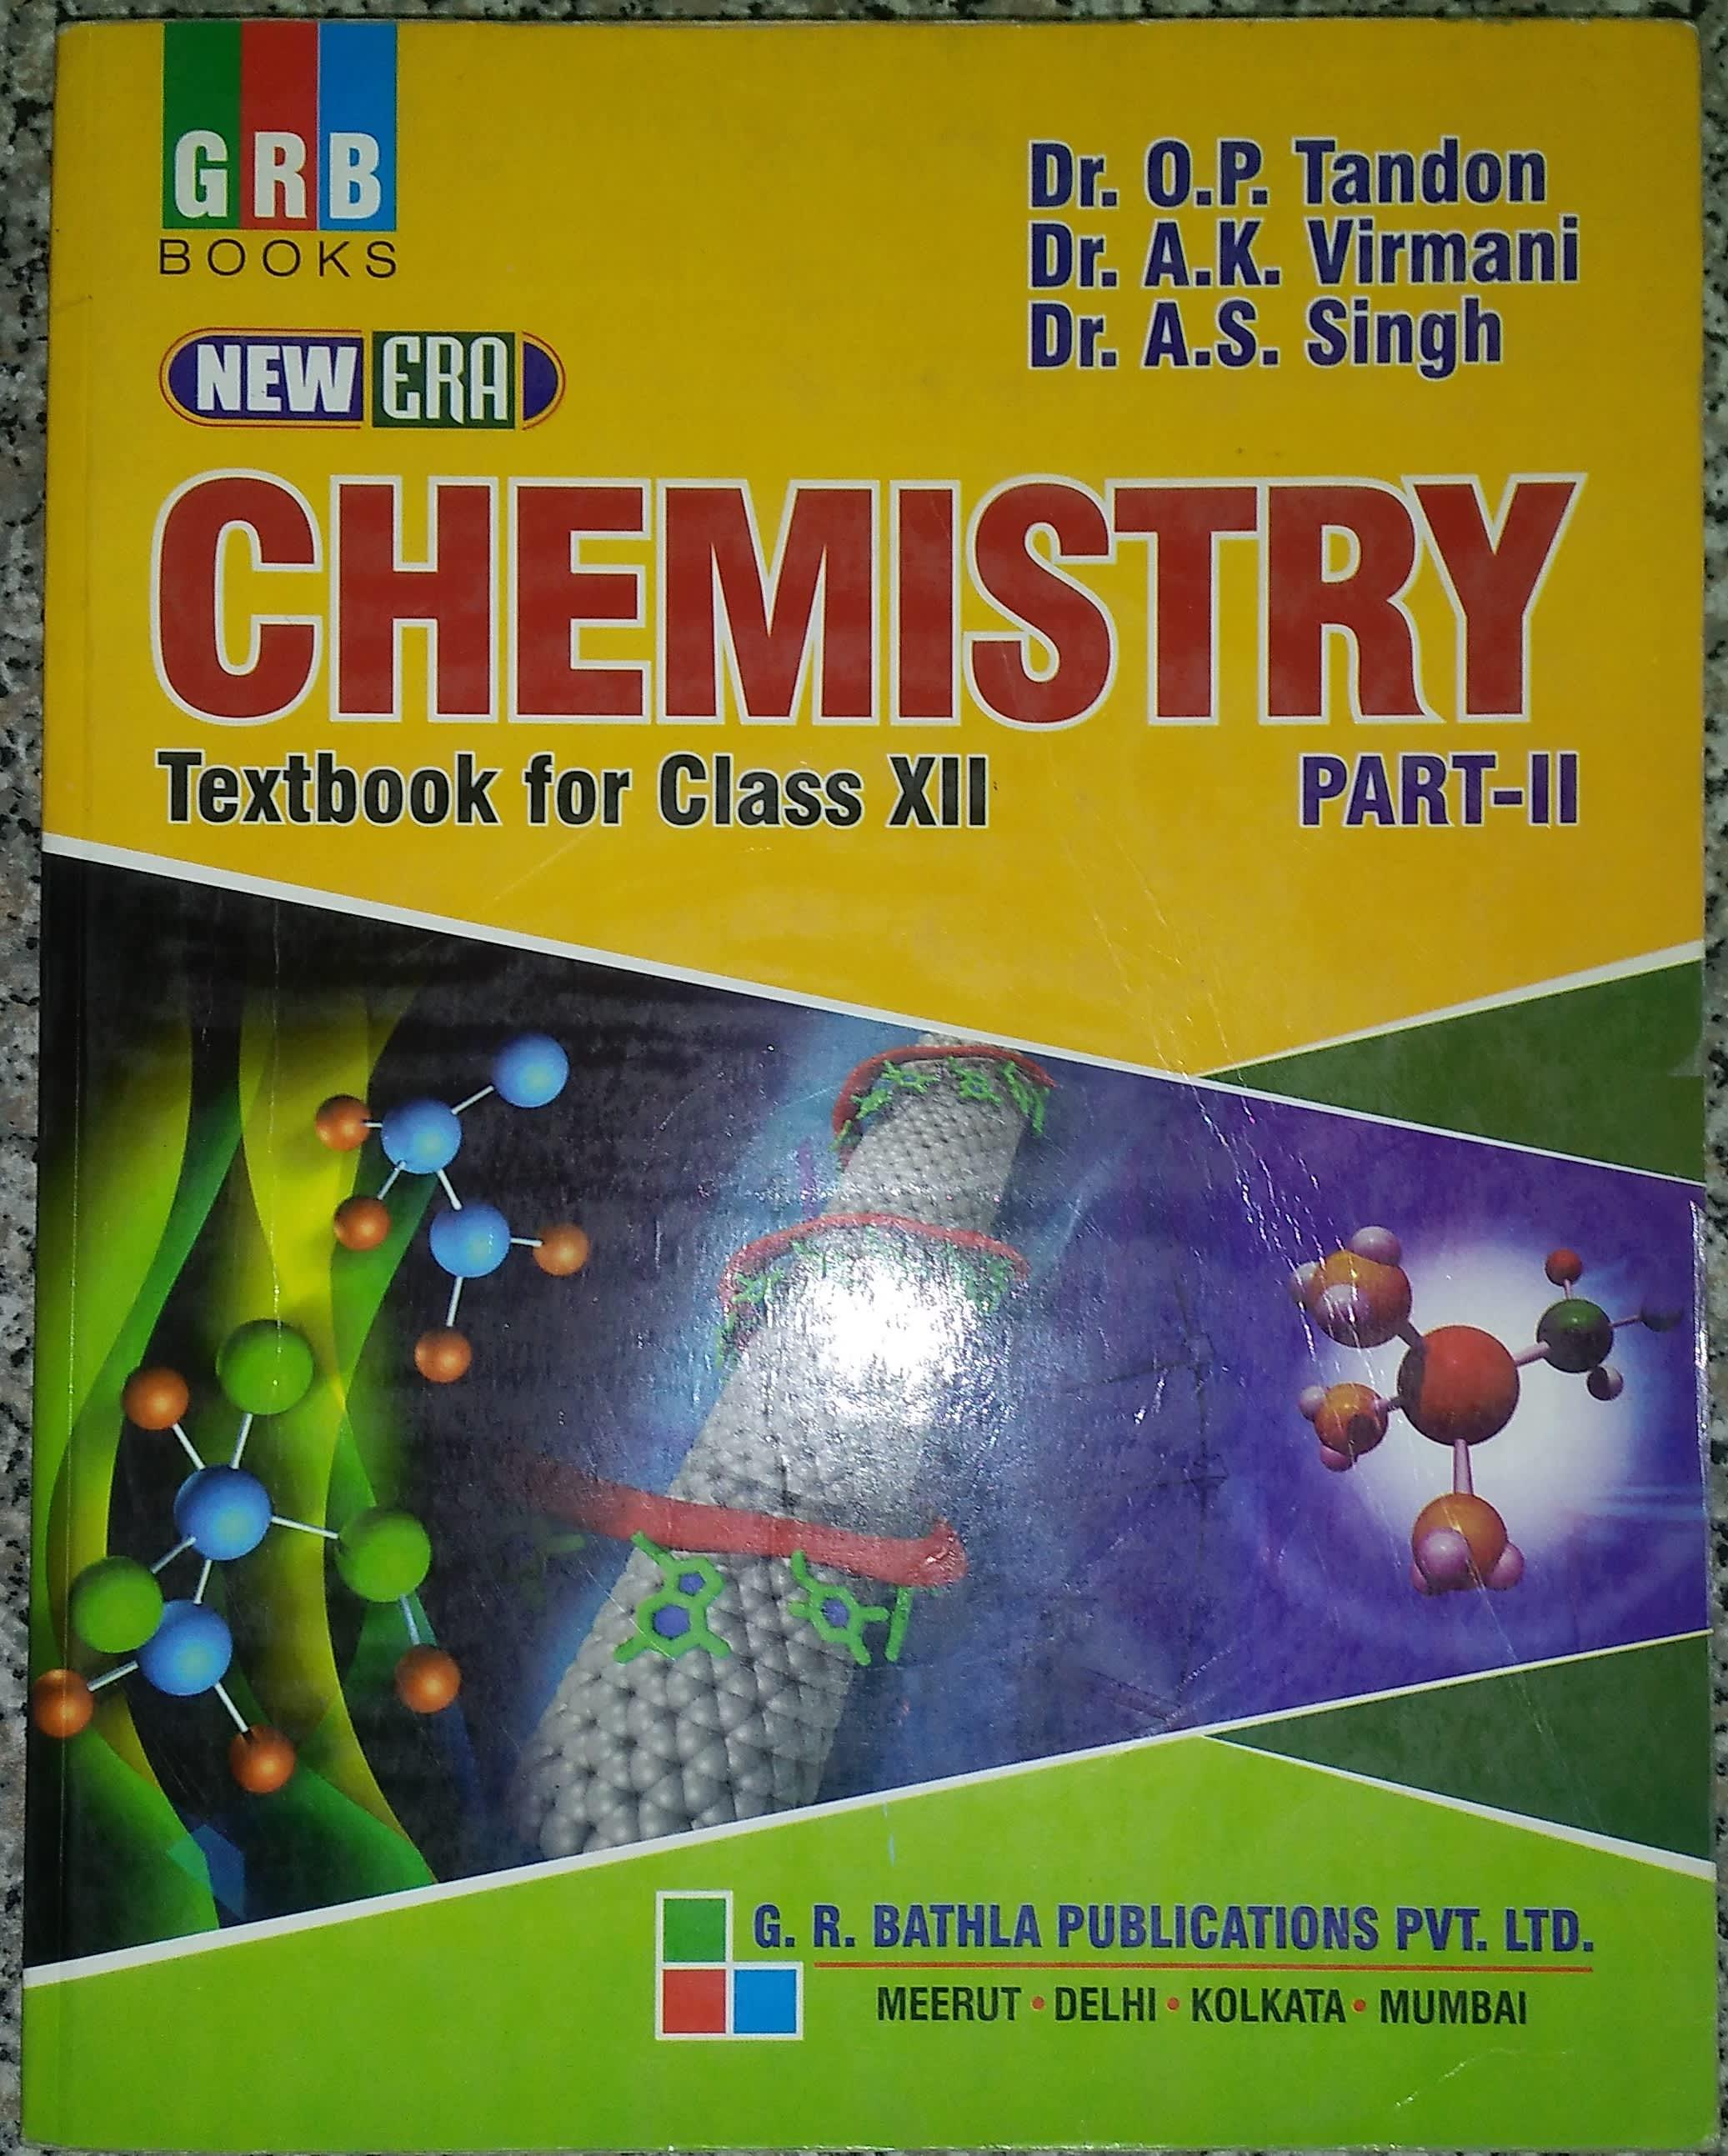 GRB New Era Chemistry for Class XII (Vol. II)